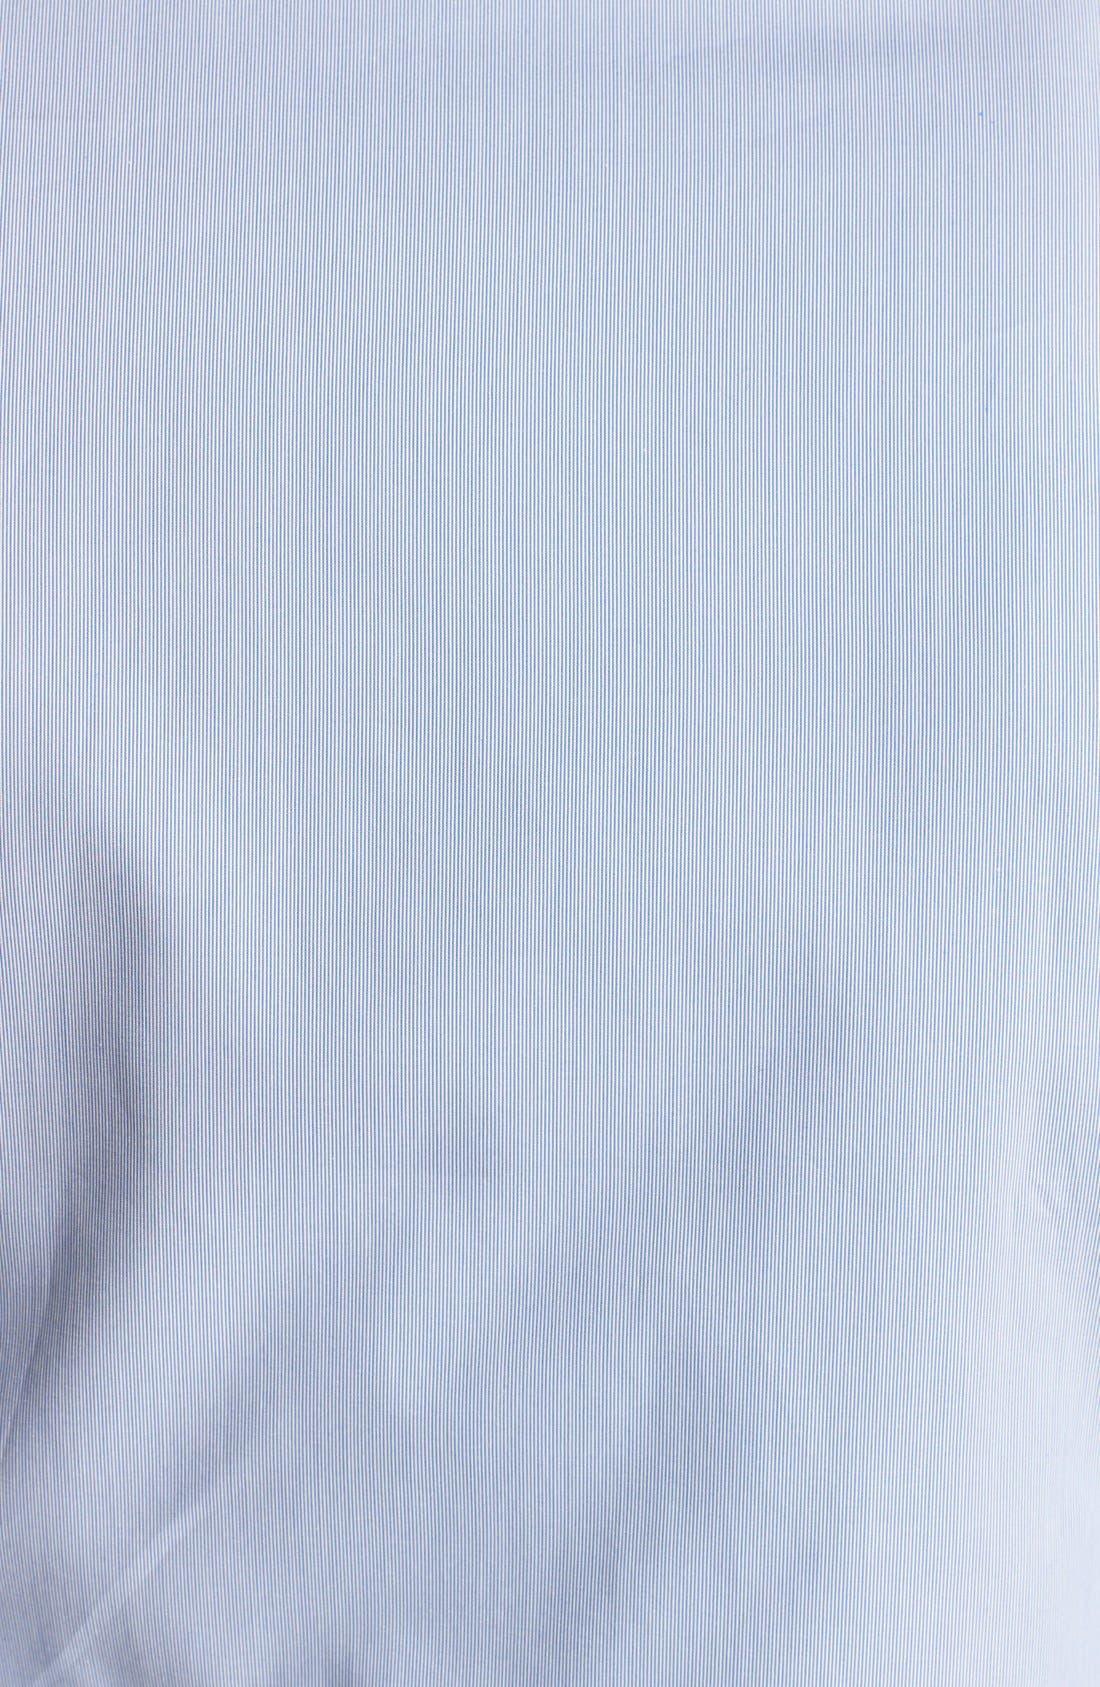 Alternate Image 3  - Z Zegna Dress Shirt